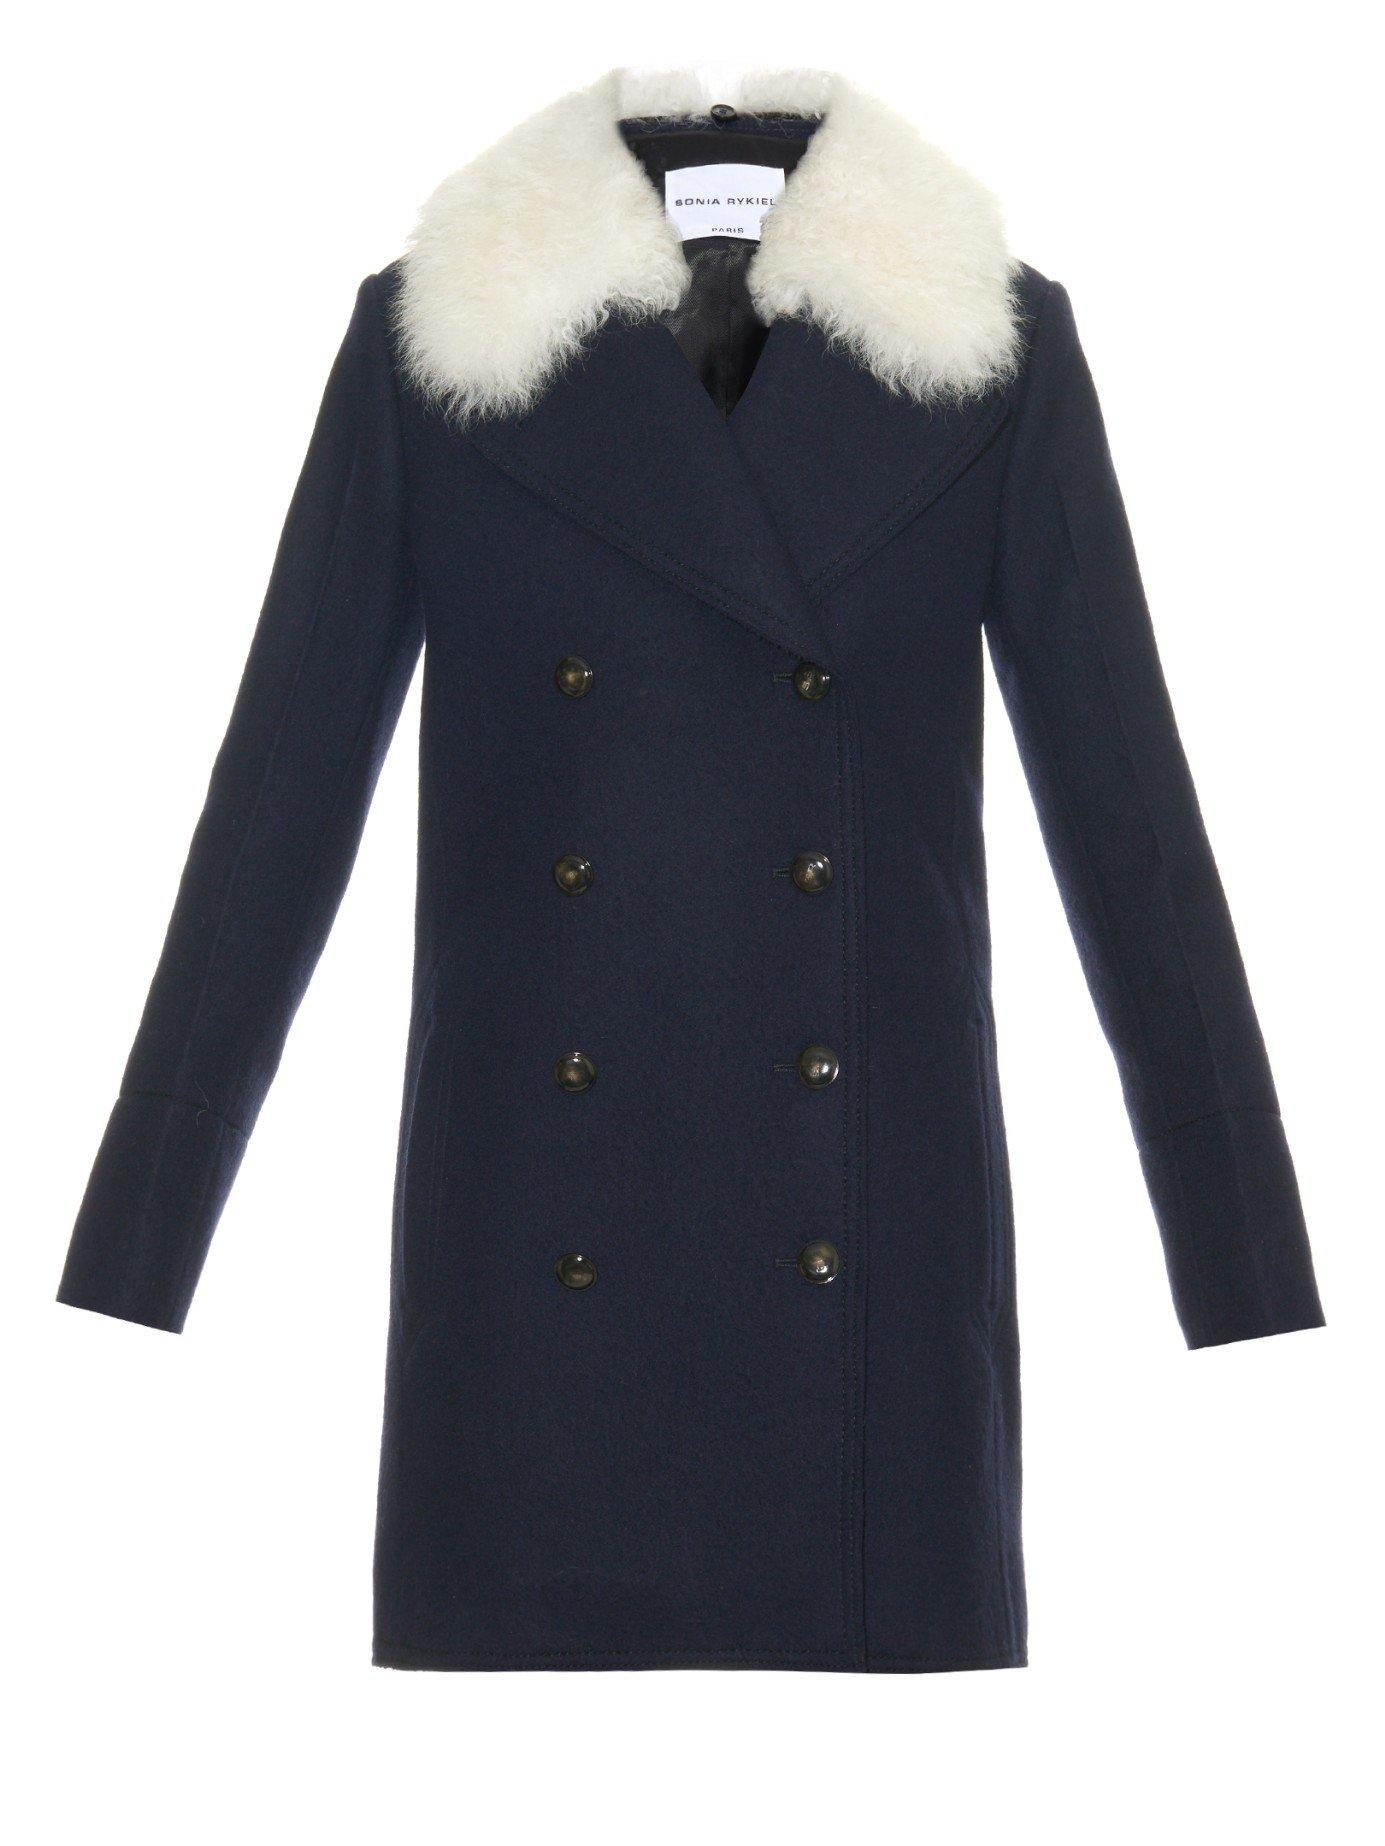 Sonia rykiel Shearling-collar Wool Coat in Blue | Lyst